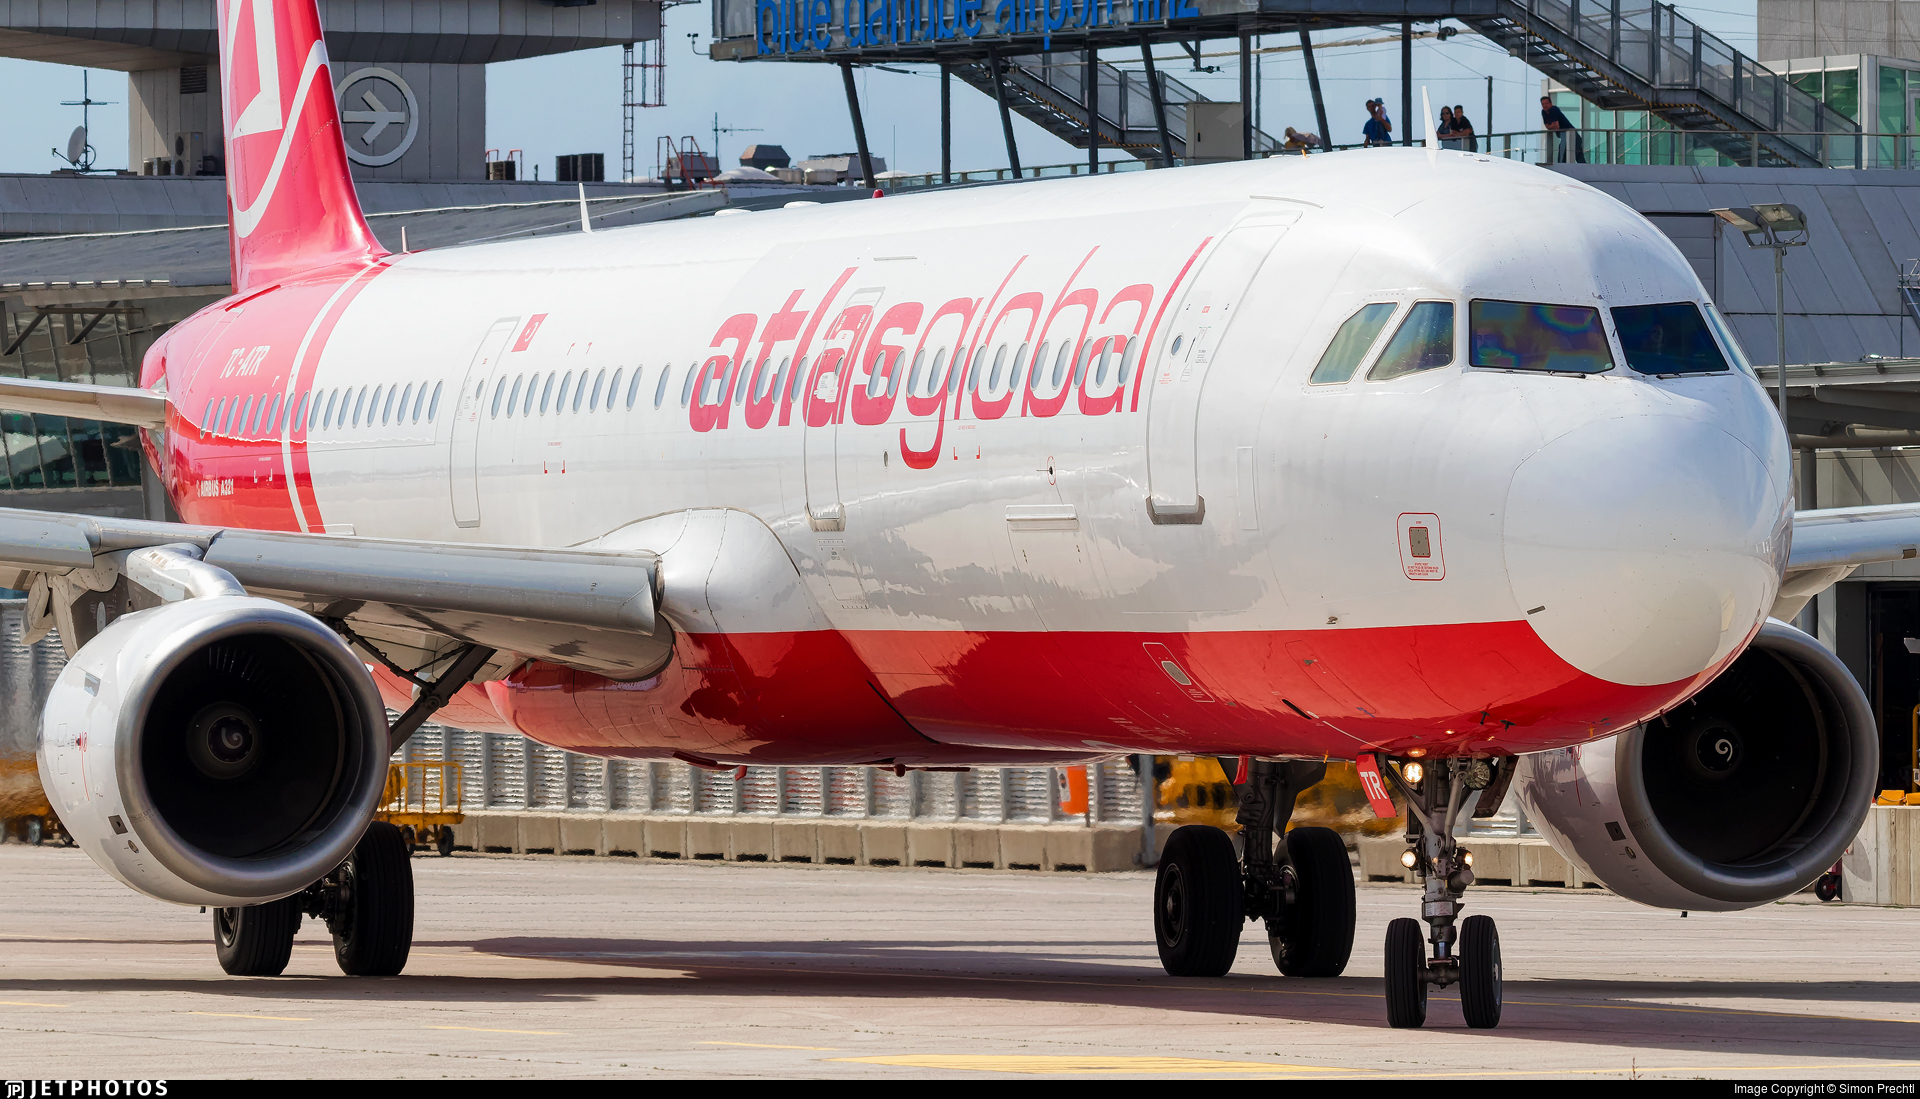 TC-ATR - Airbus A321-211 - AtlasGlobal